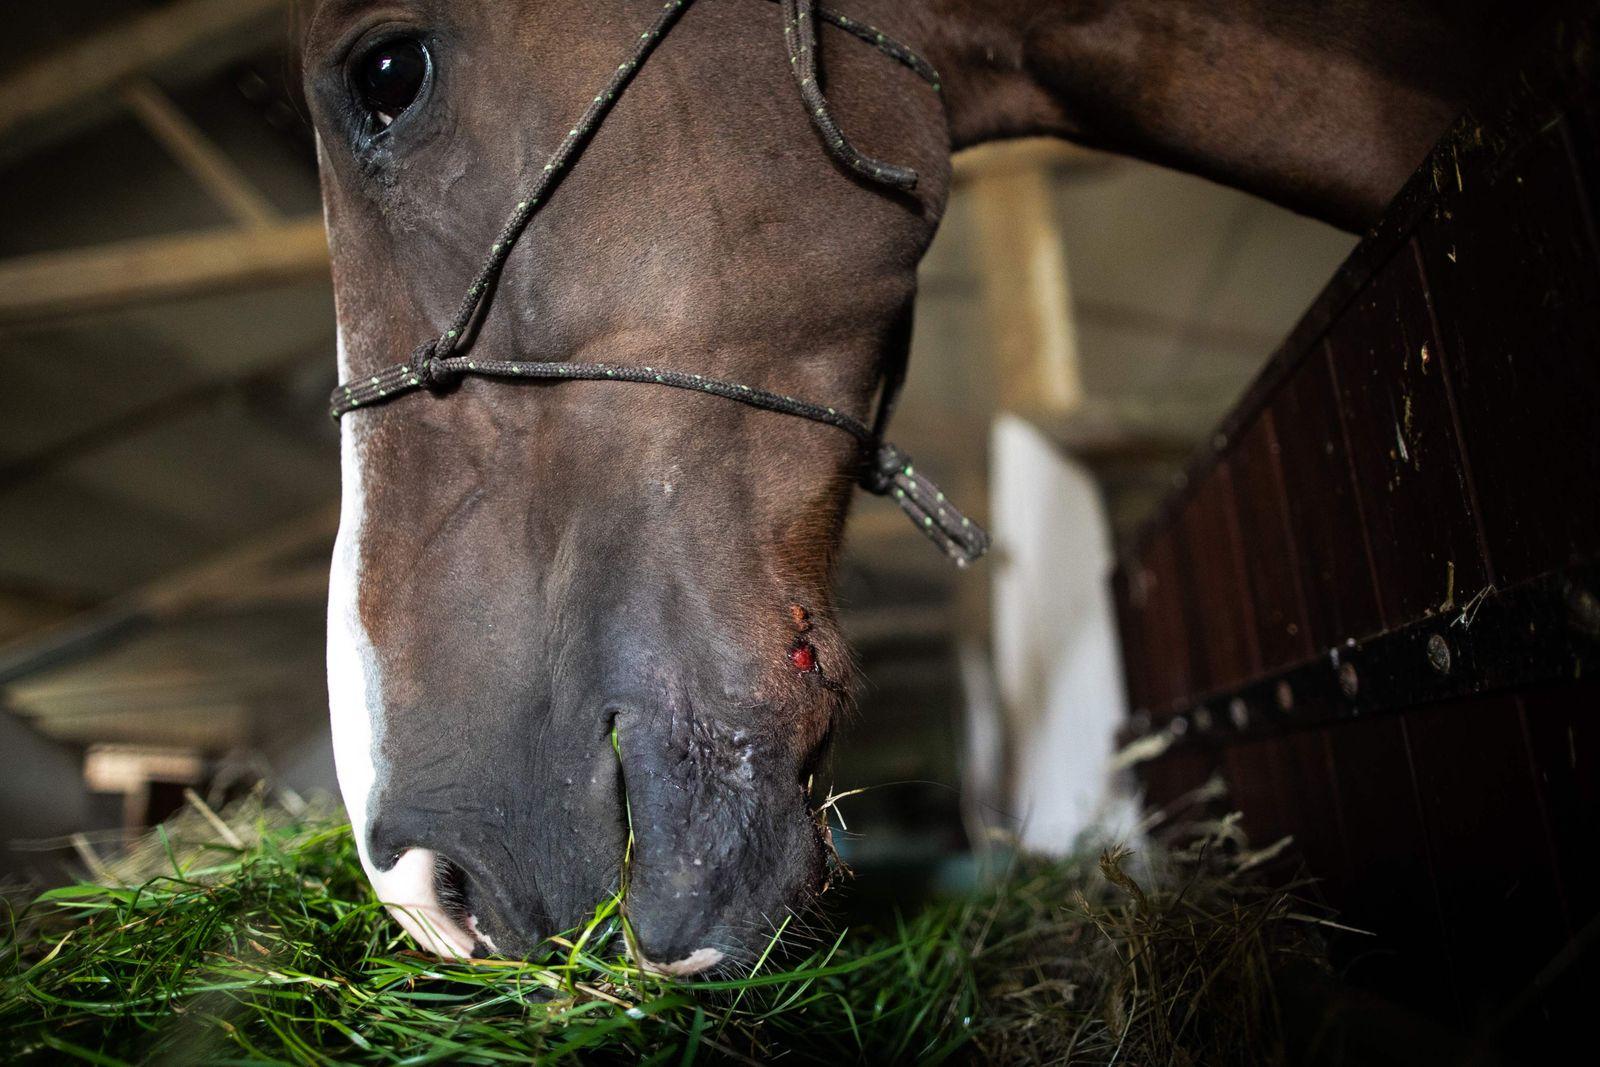 FRANCE-AGRICULTURE-ANIMALS-INVESTIGATION